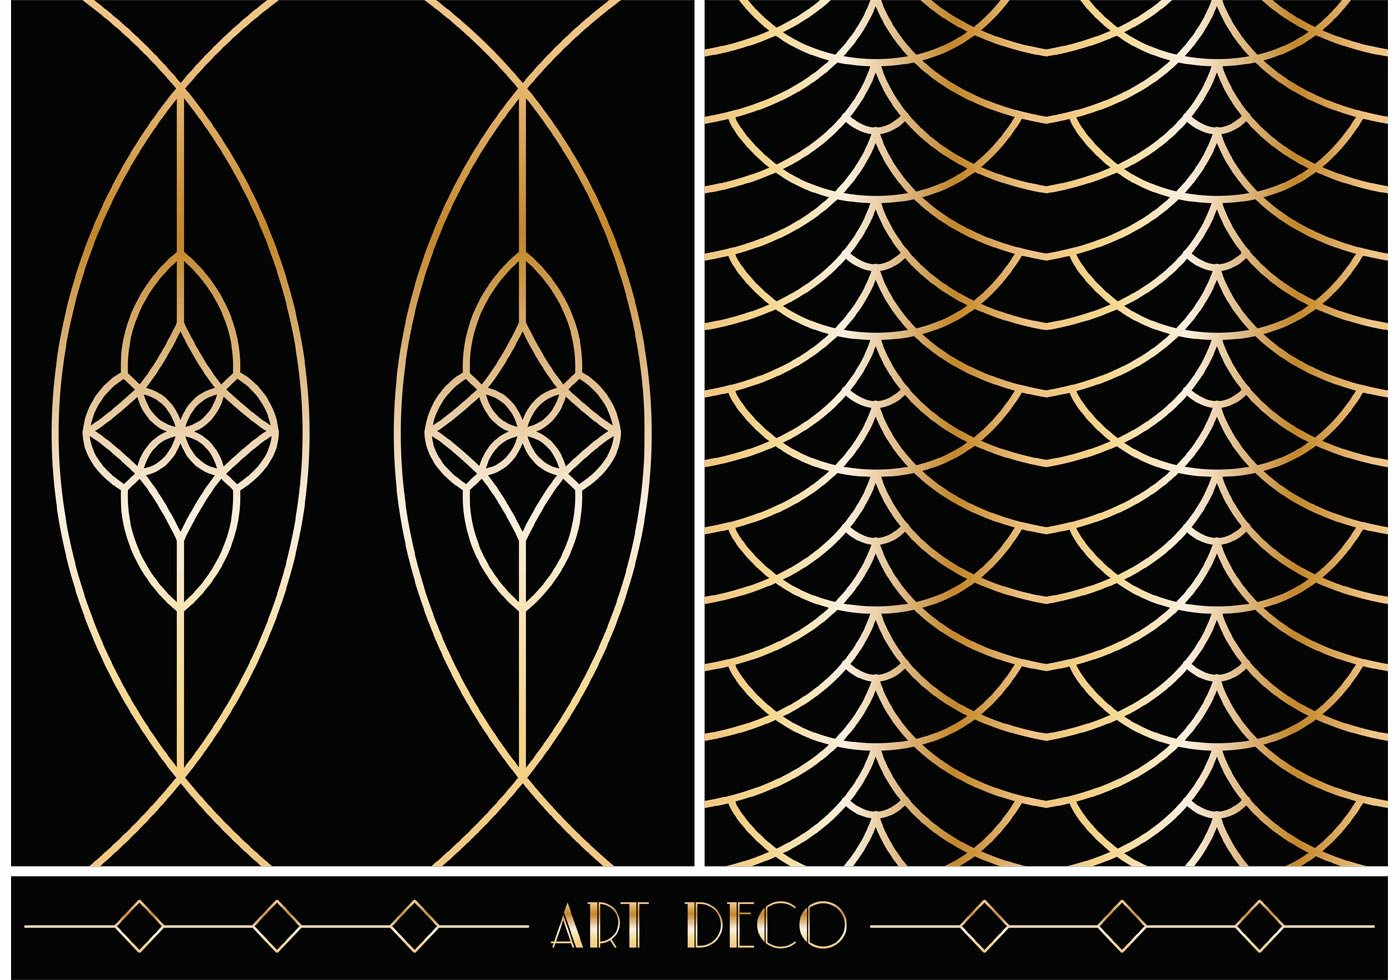 Free Art Deco Templates Luxury Art Deco Geometric Vector Patterns Download Free Vector Art Stock Graphics &